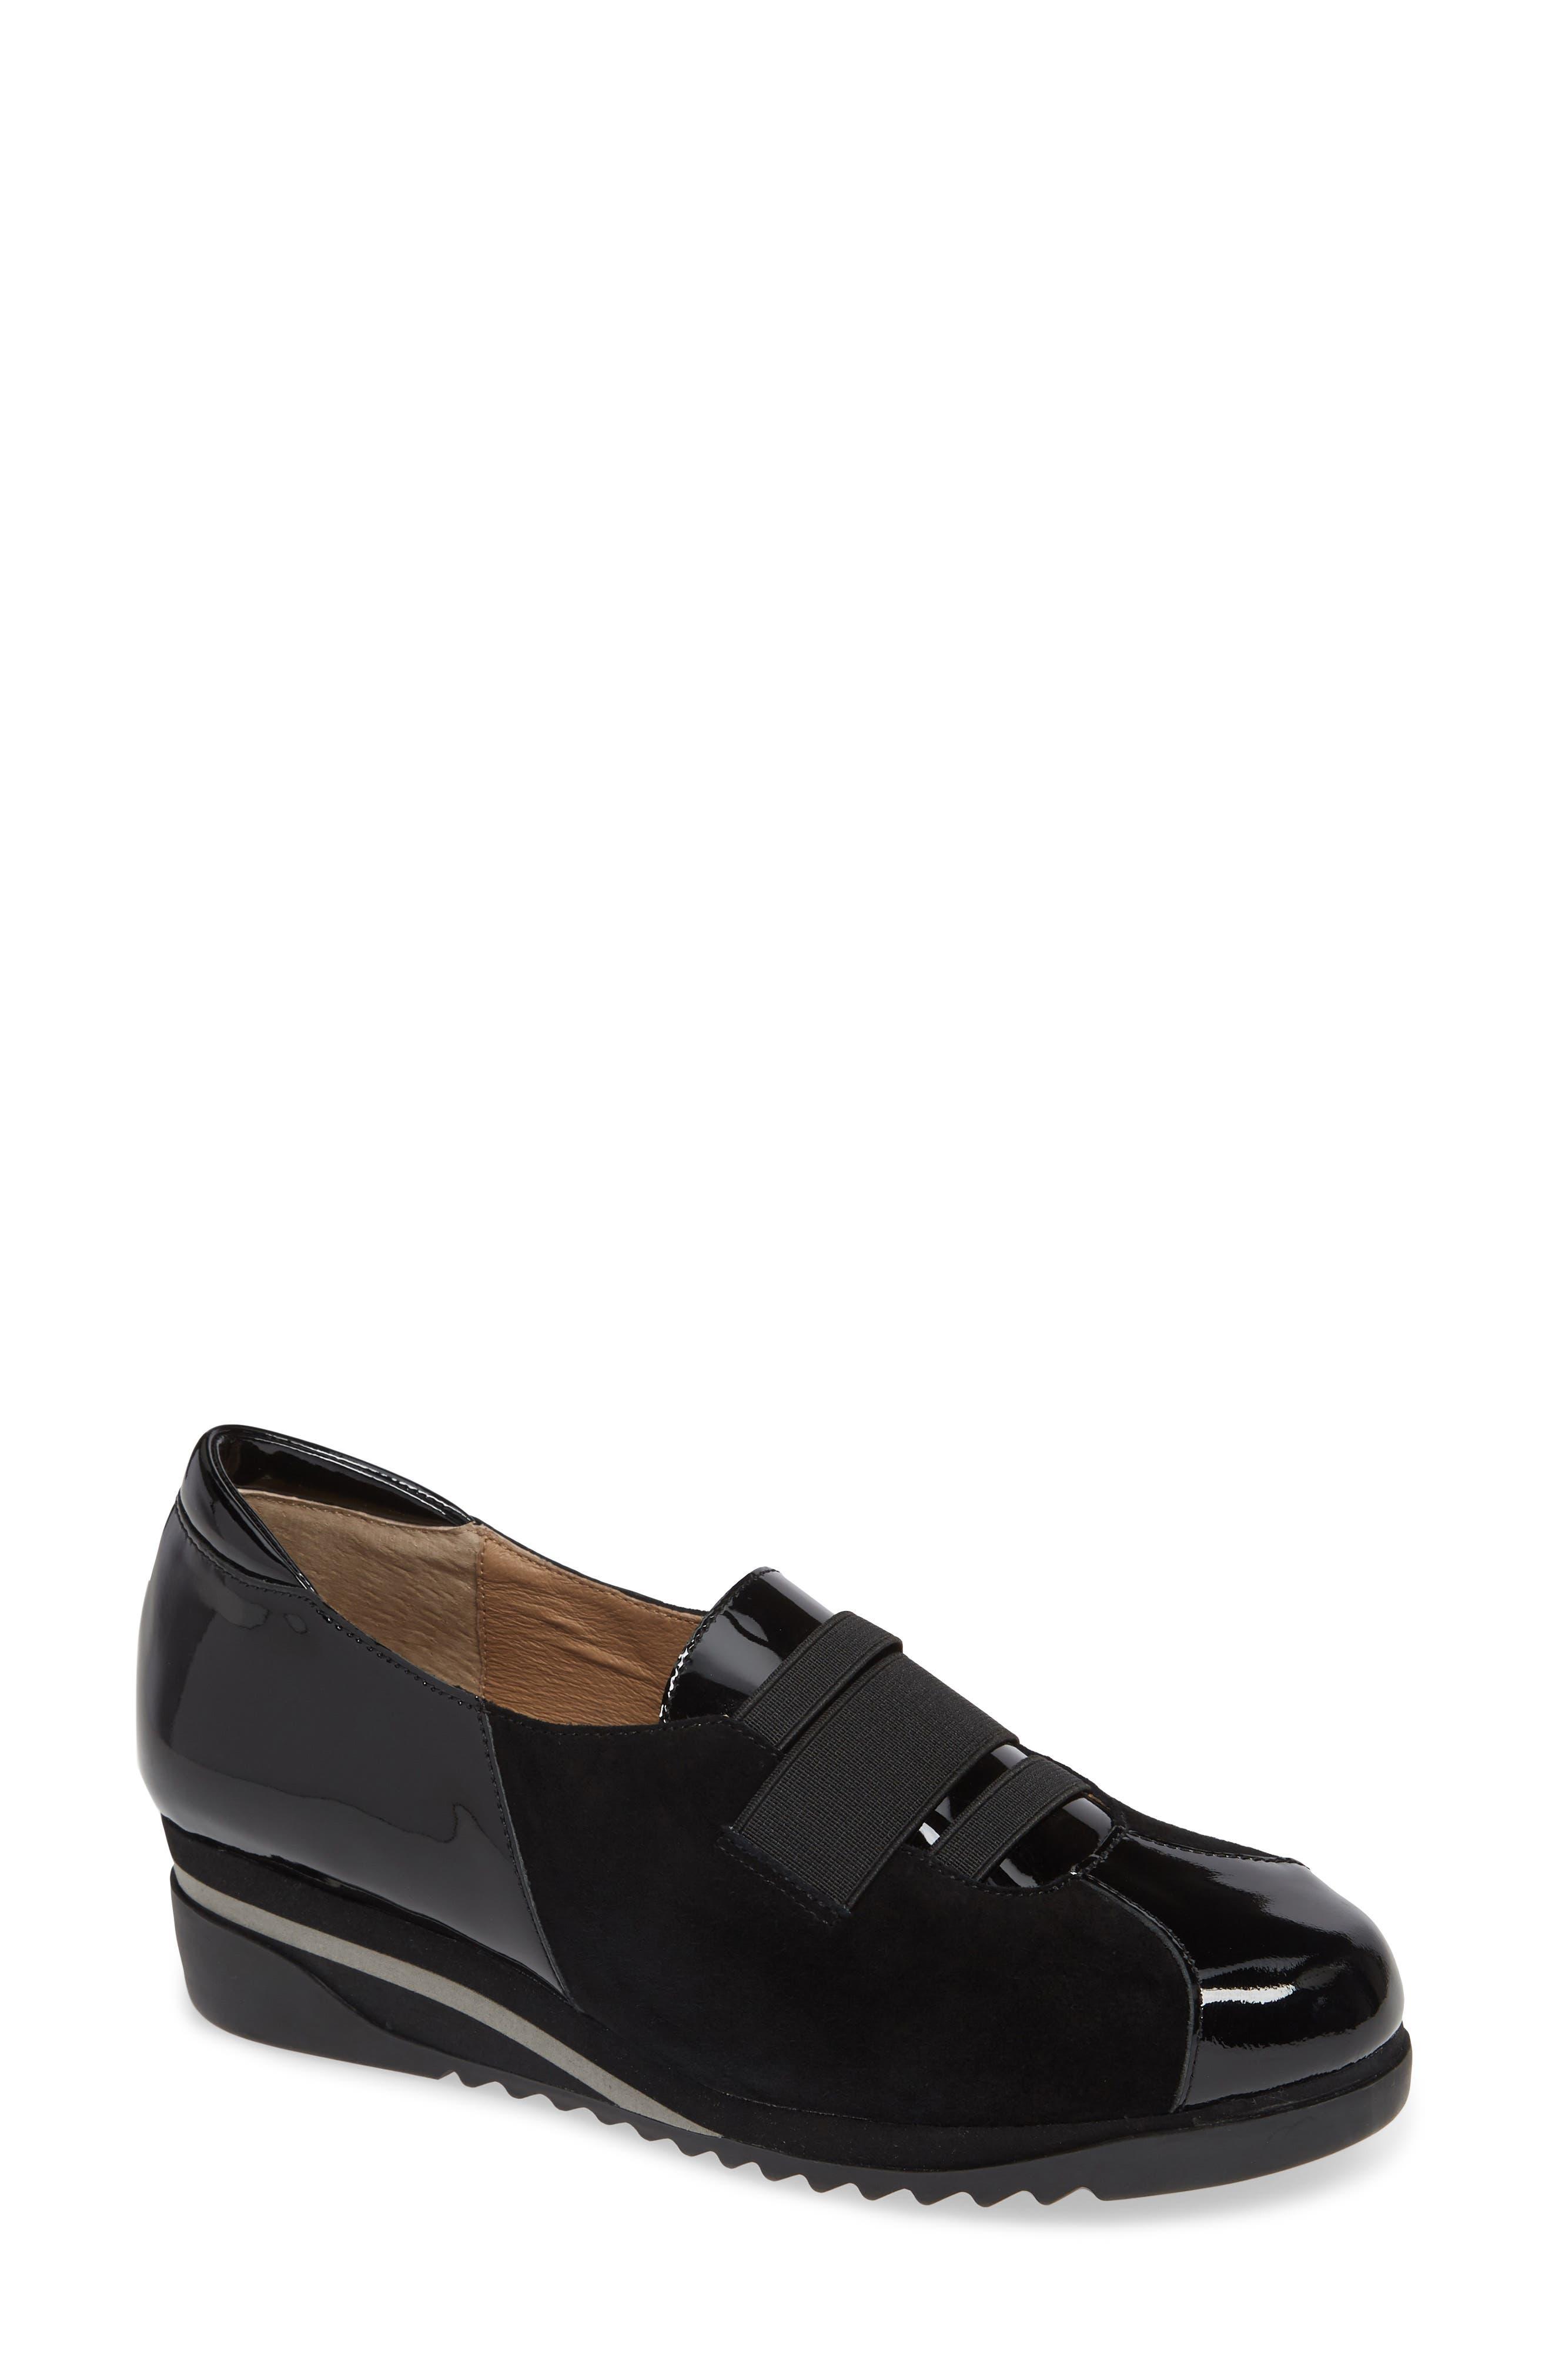 BETTYE MULLER CONCEPTS Taytum Sneaker, Main, color, BLACK SUEDE